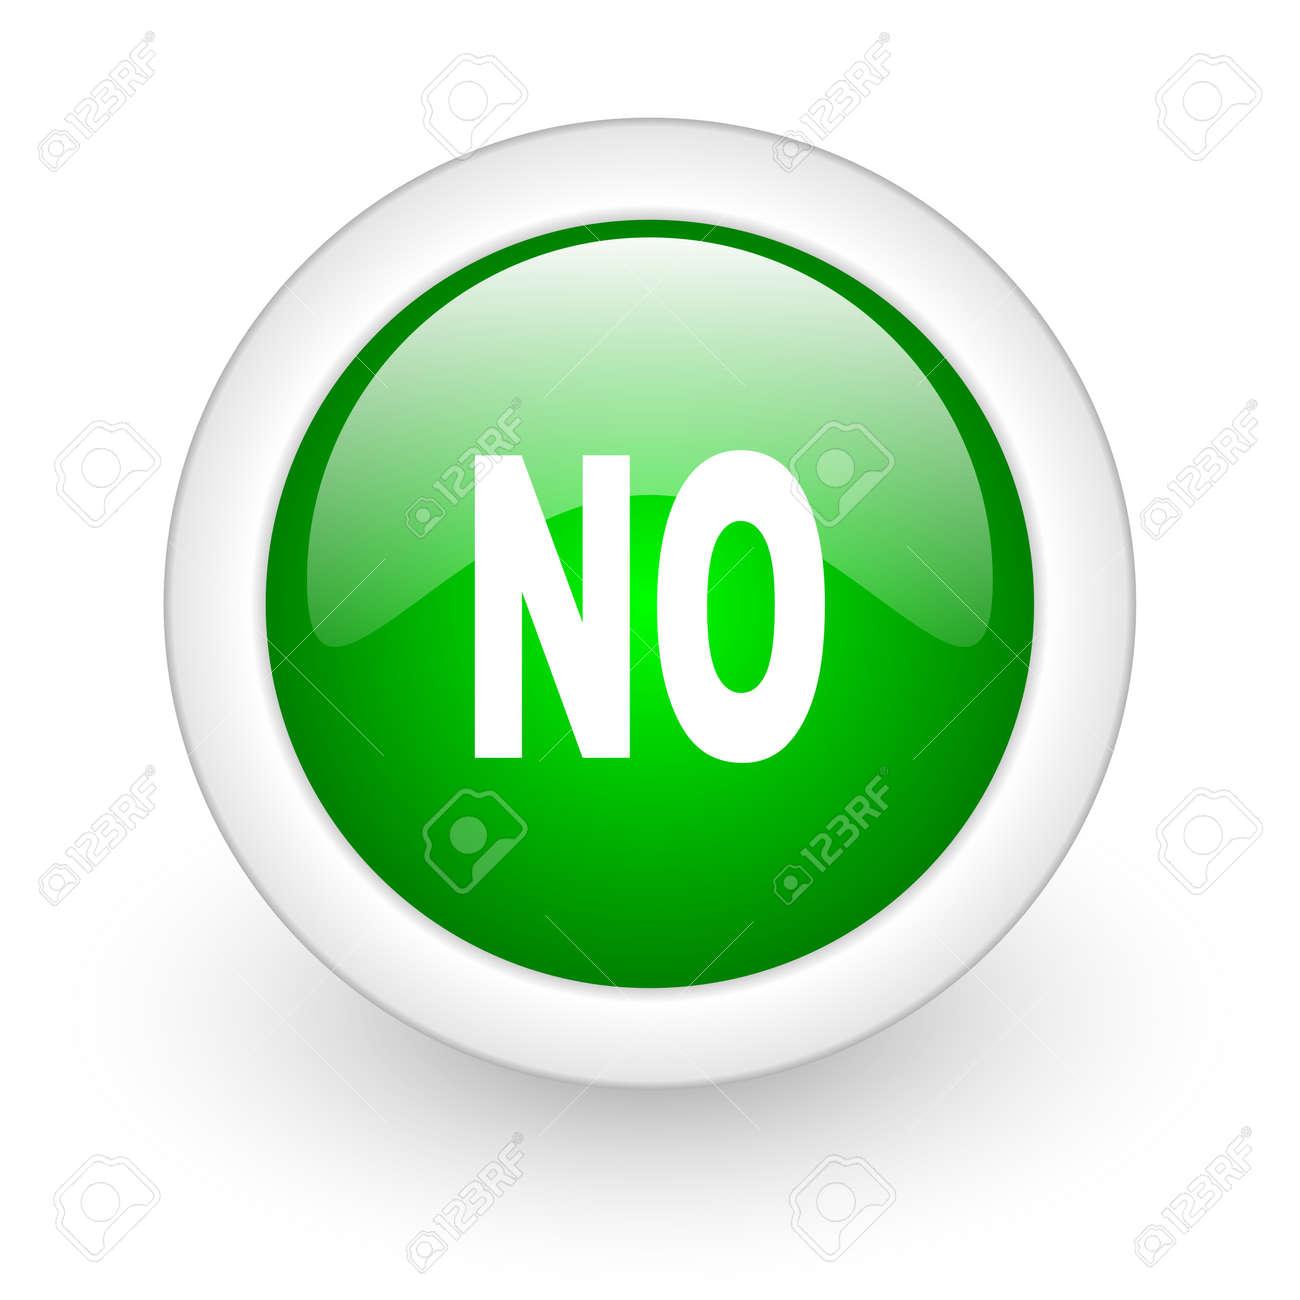 no green circle glossy web icon on white background Stock Photo - 17864831